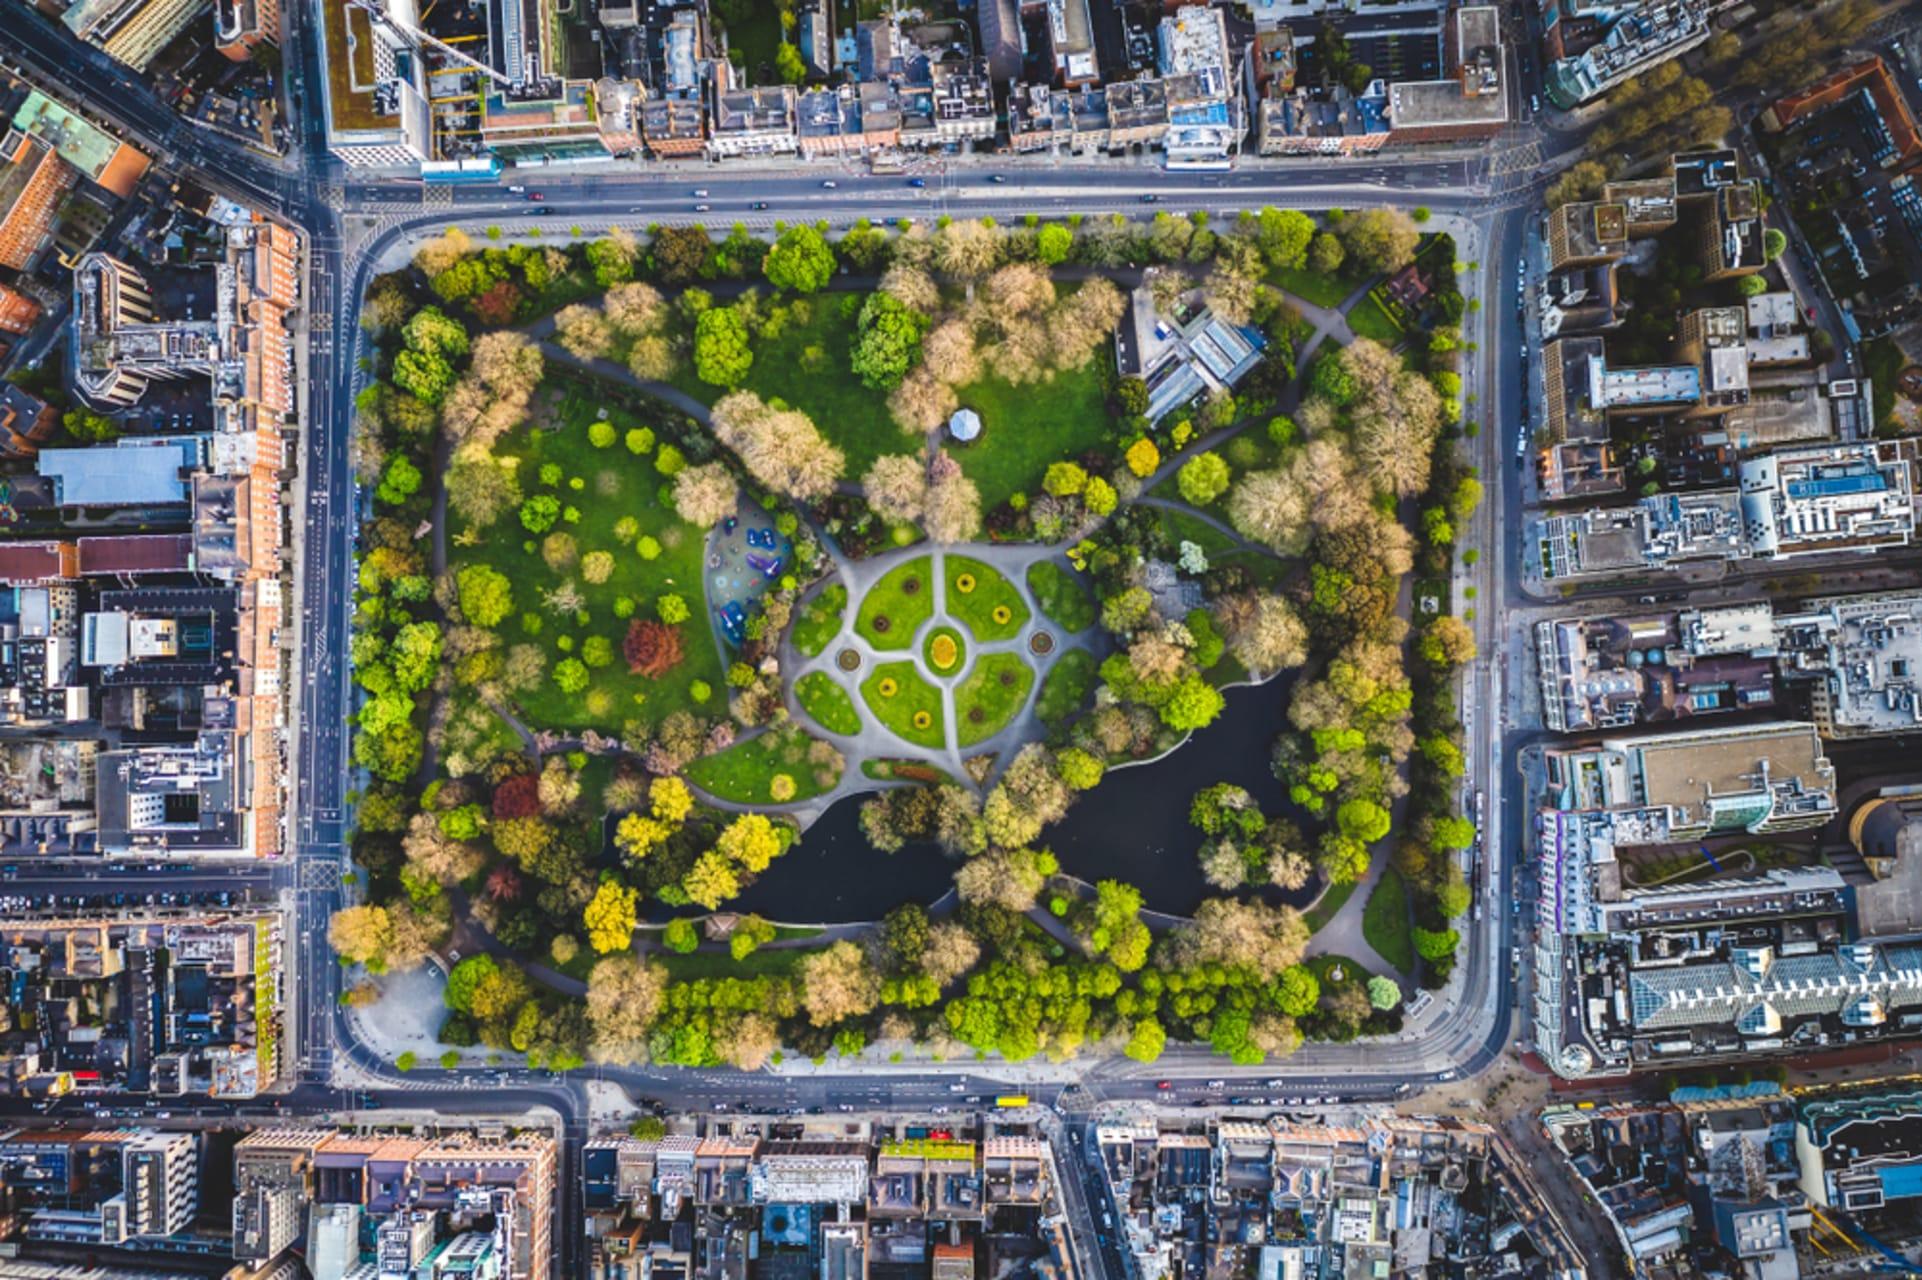 Dublin - Stephens Green - Dublin's oldest and most popular City Park